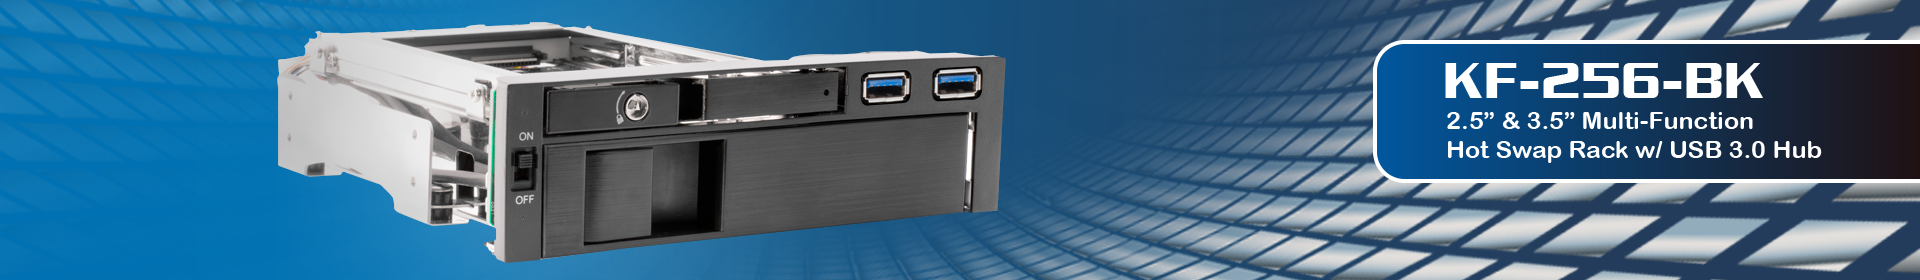 KF-256-BK_Product_Header